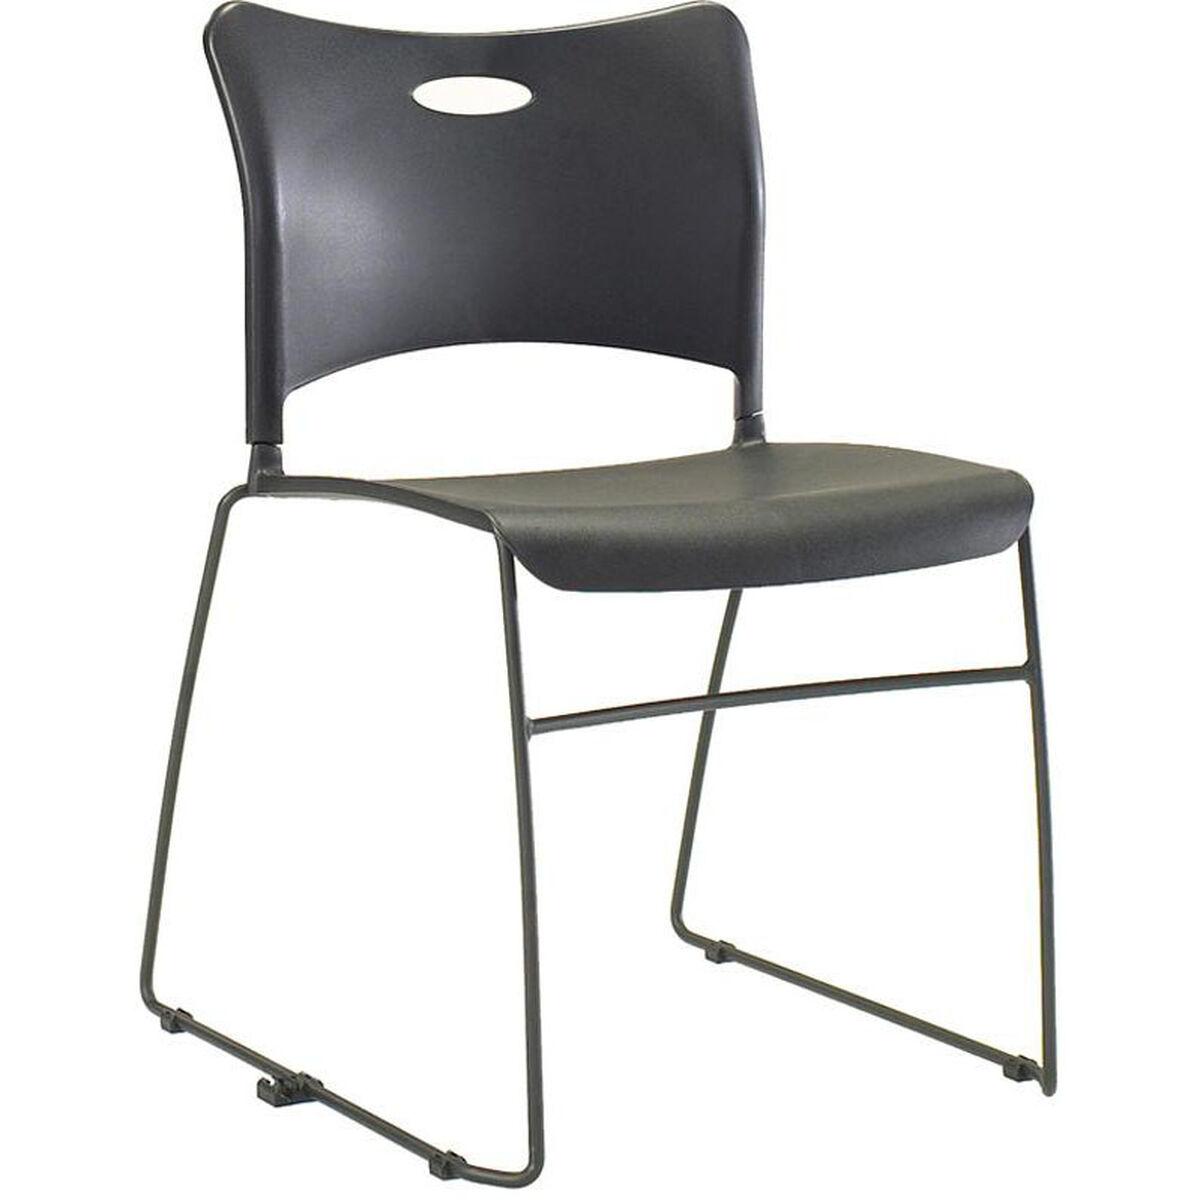 High Point Furniture Industries 723 Hpf 723